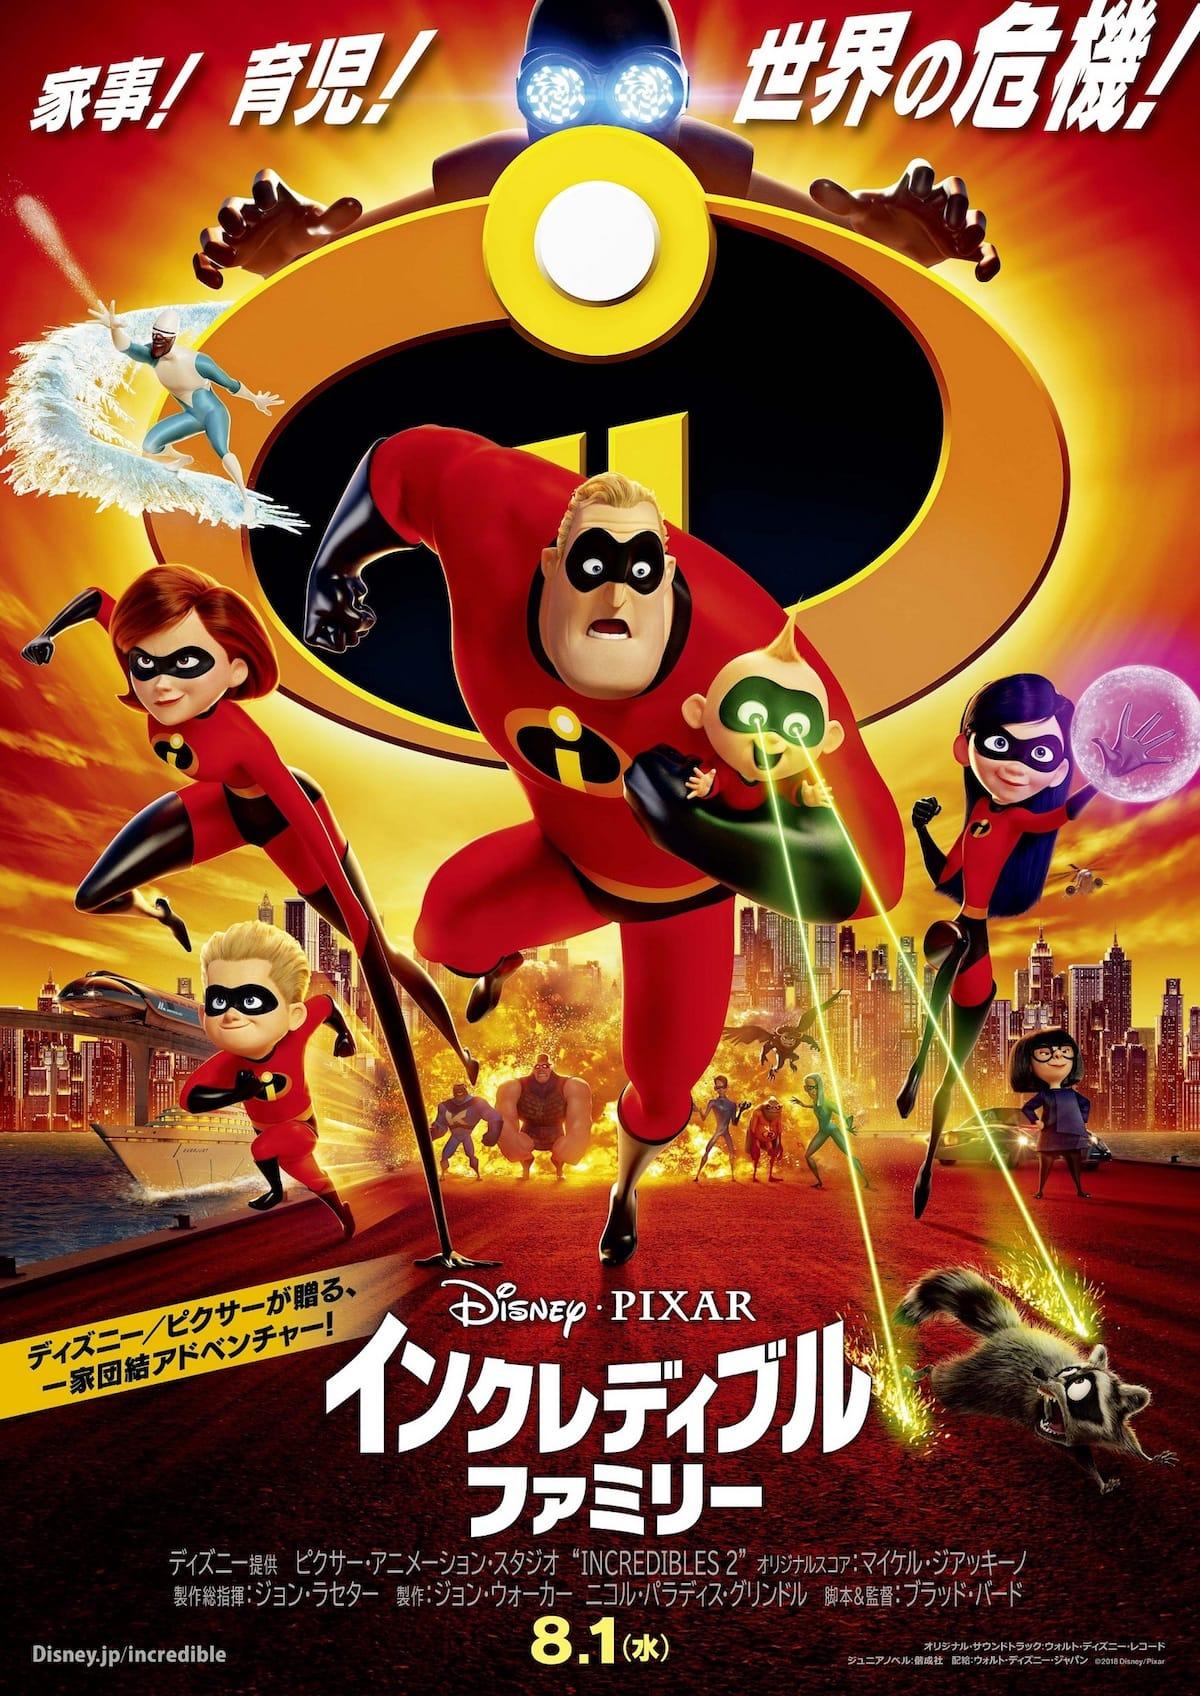 『Mr.インクレディブル』の最新作『インクレディブル・ファミリー』日本最速試写会にご招待! film180604_incredible-family_1-1200x1696